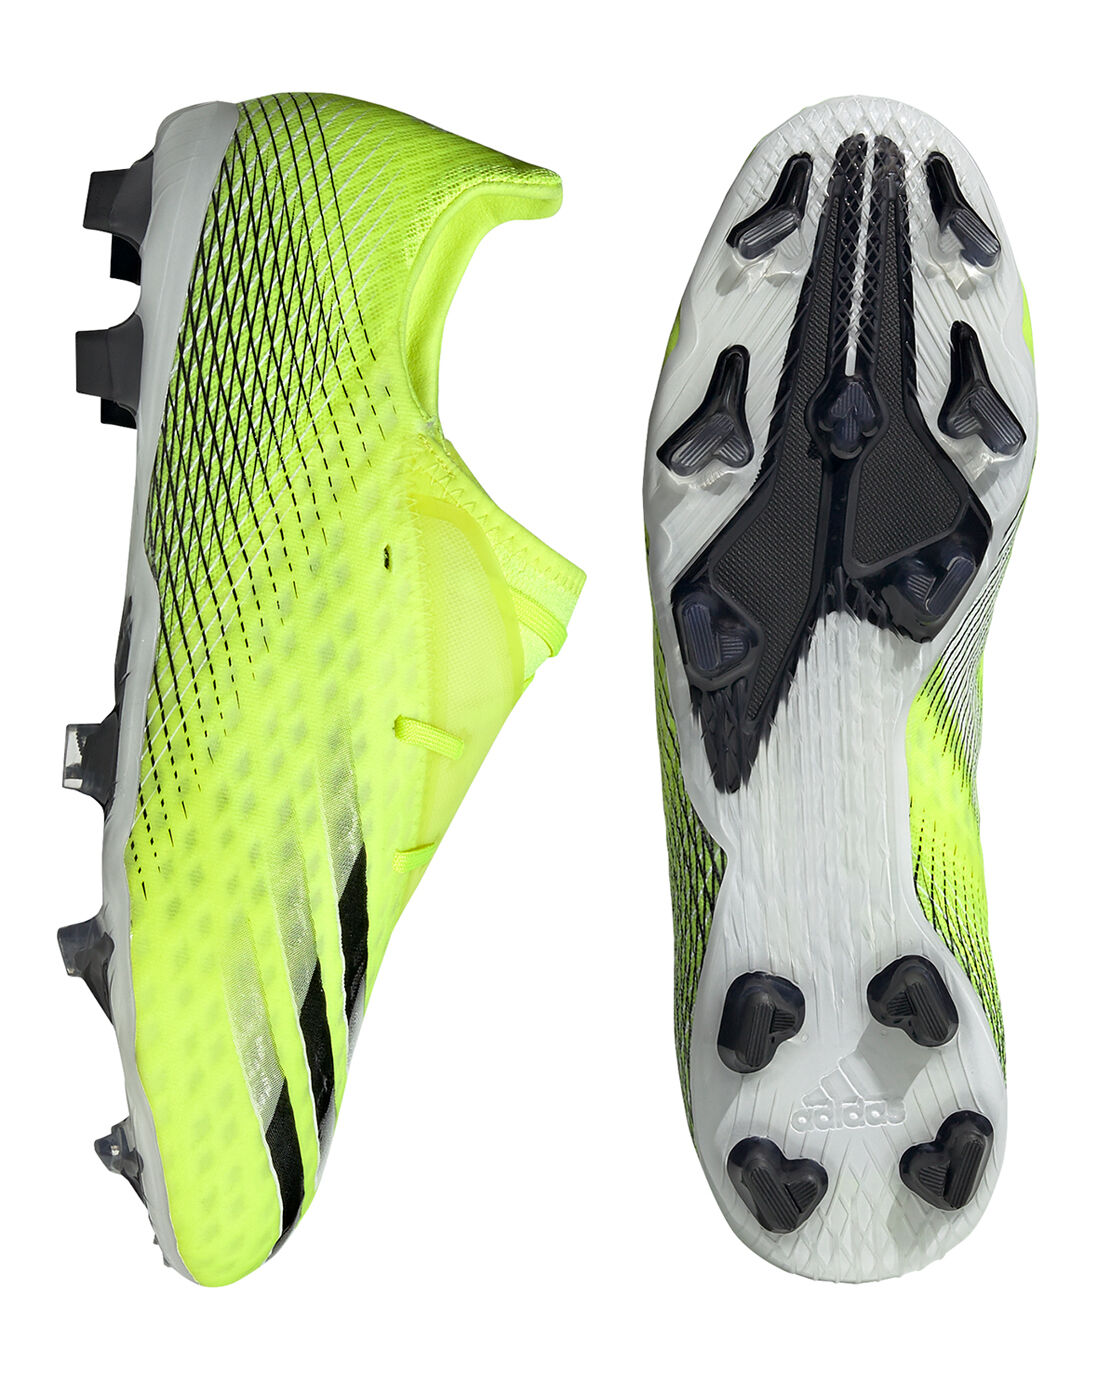 adidas jordan nike free run 3 mint green shoes size 2 | Adult X 20.2 Firm Ground